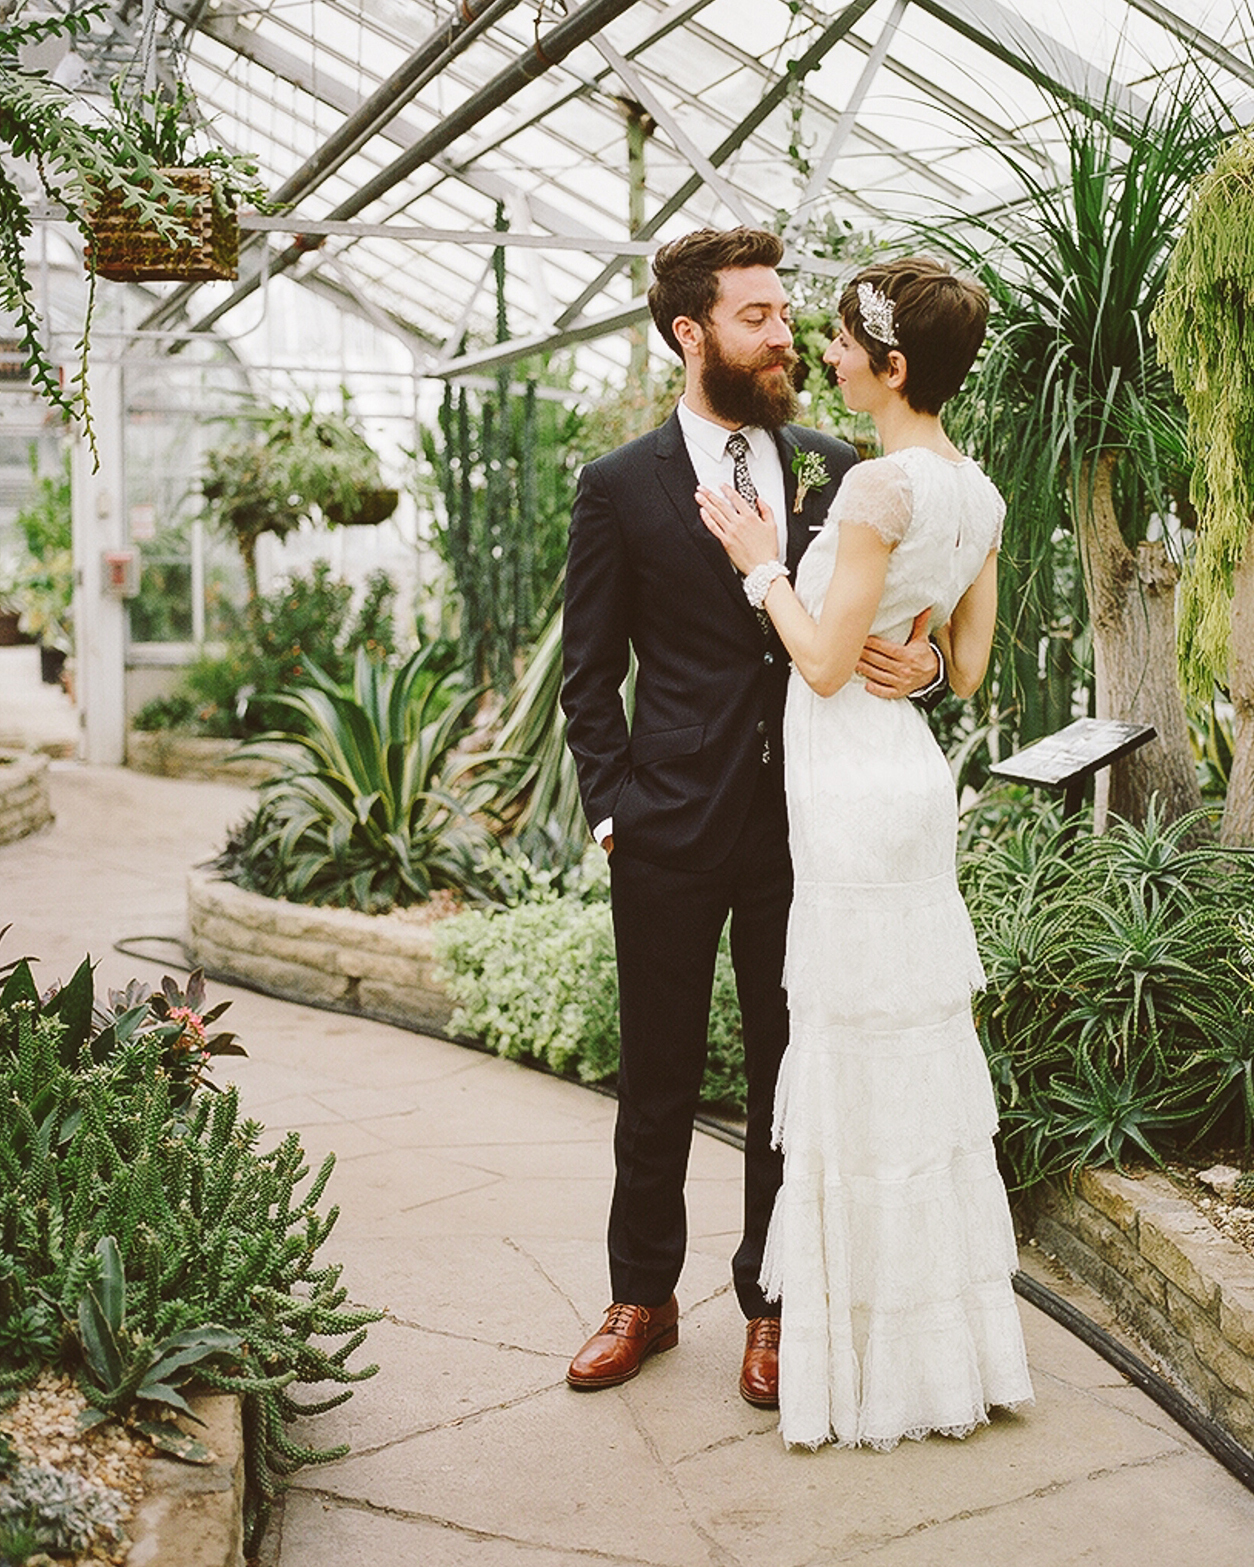 trish-alan-wedding-portrait1-026-s111348-0714.jpg